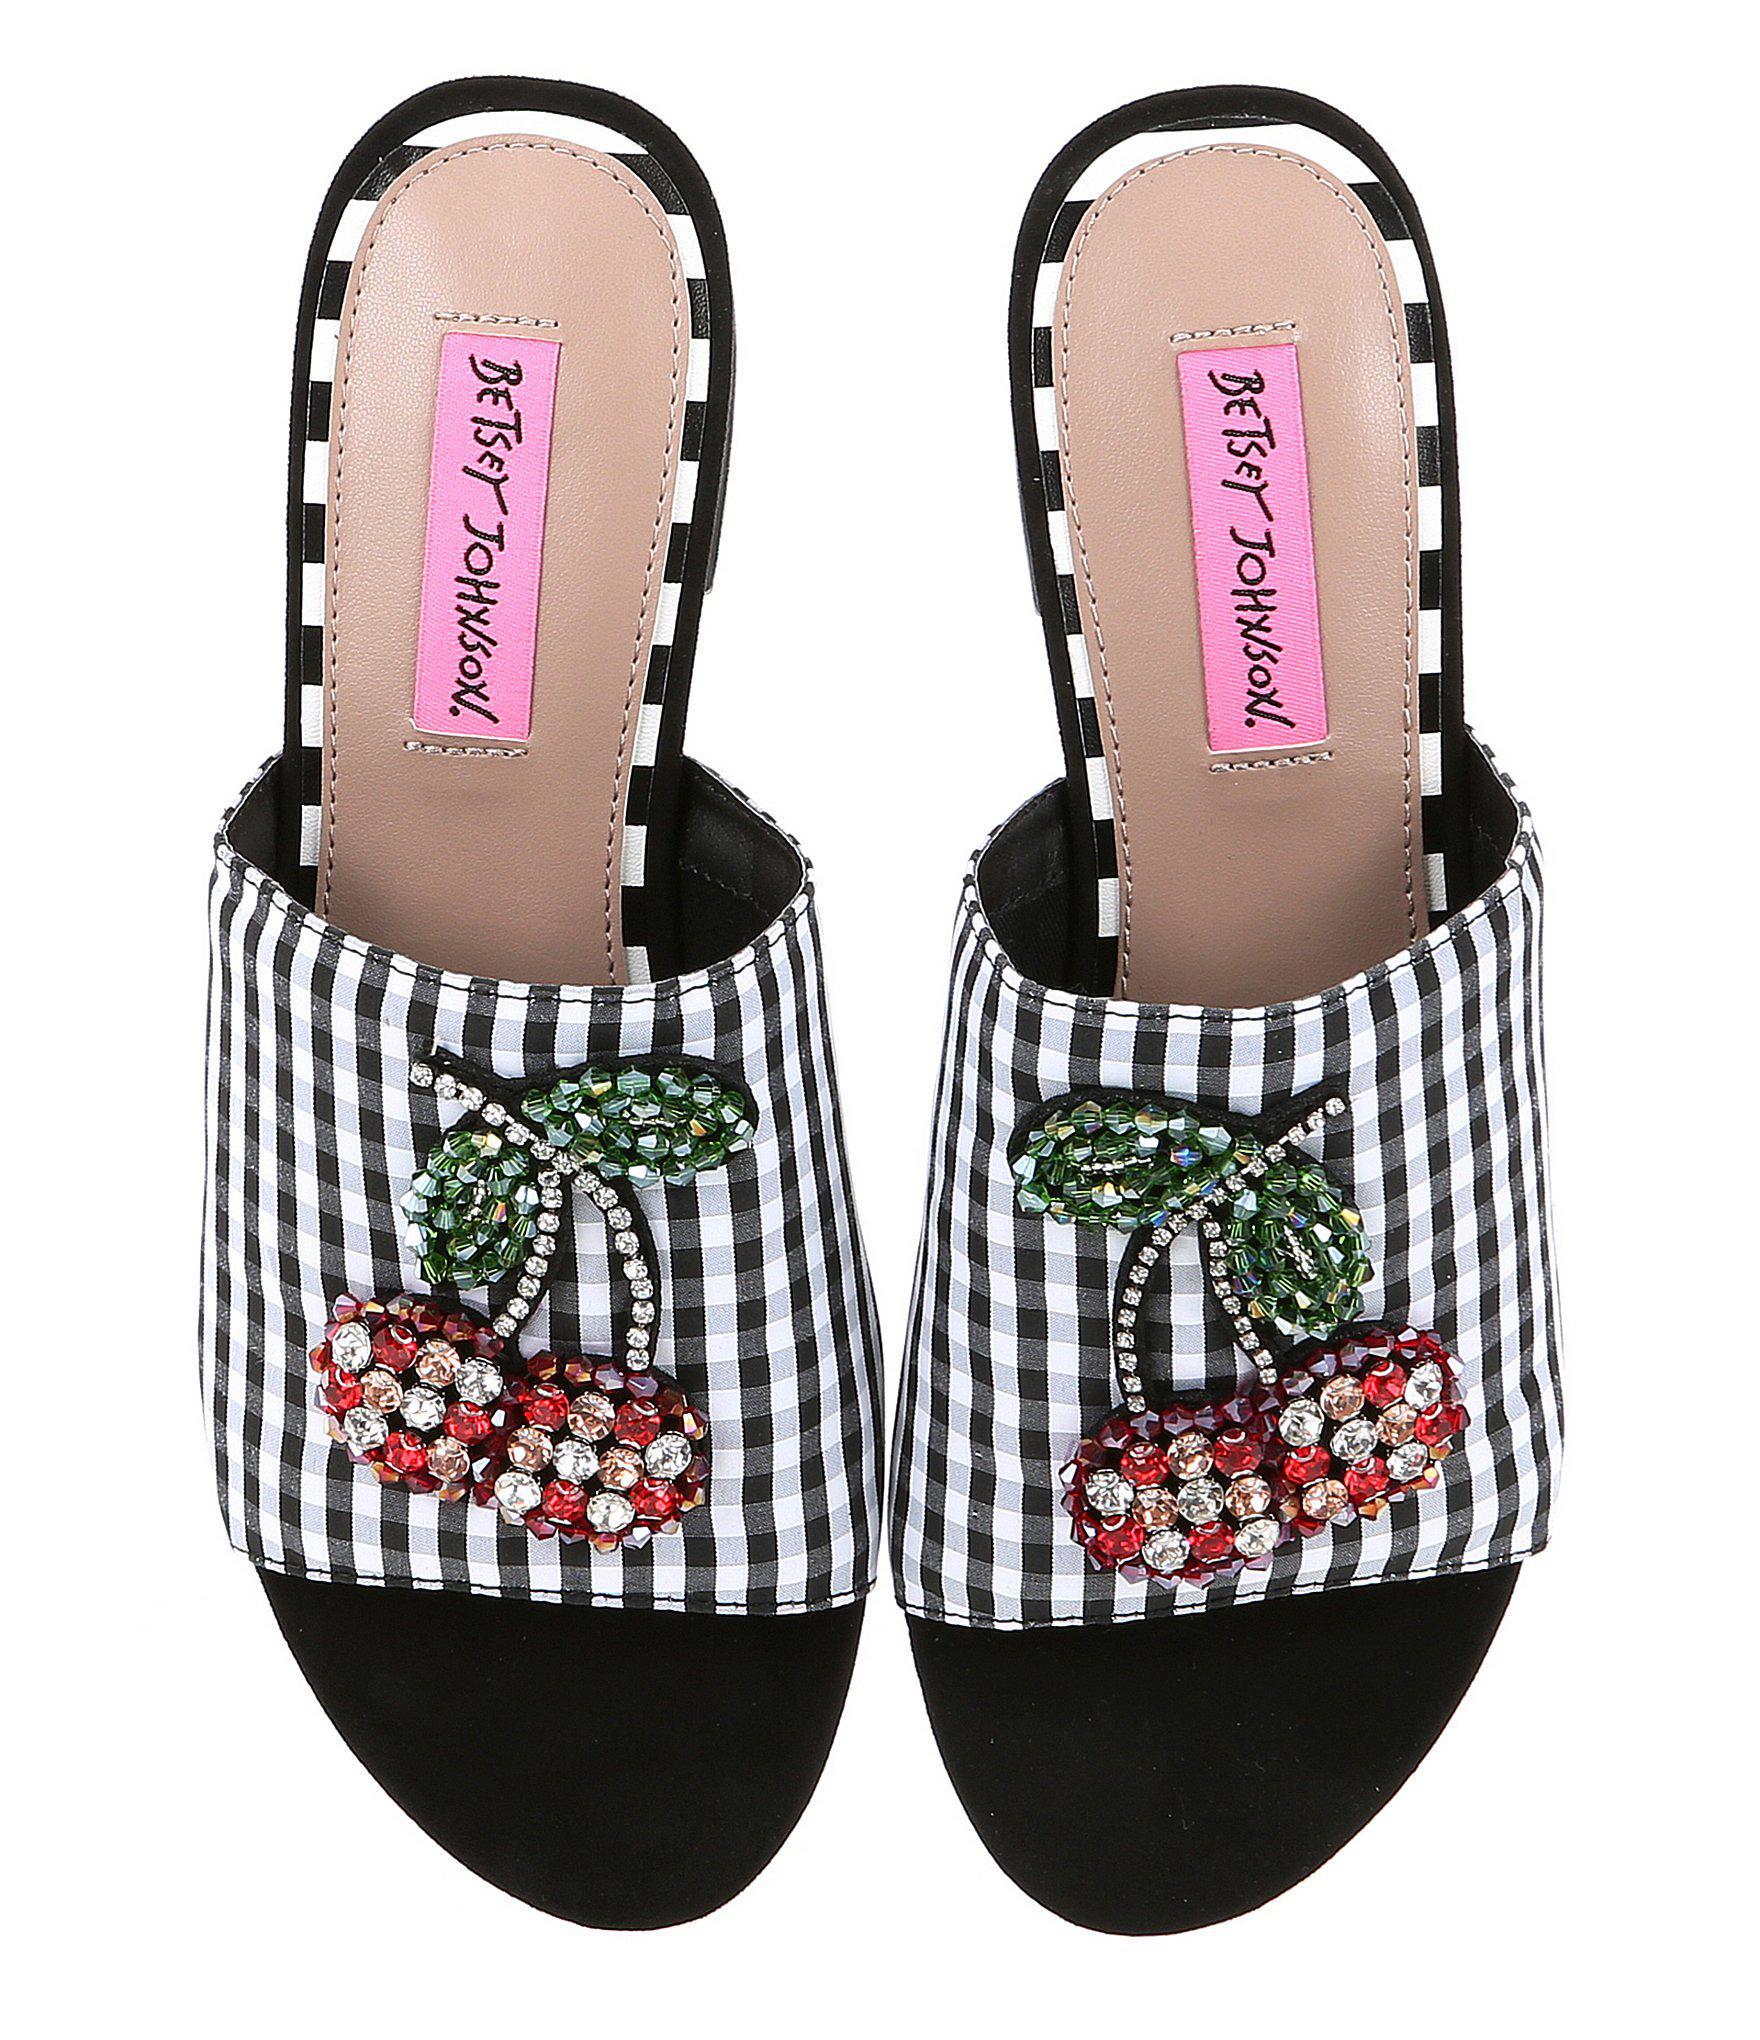 899dac63151 Lyst - Betsey Johnson Heat Gingham Jeweled Cherry Slide Sandals in Black